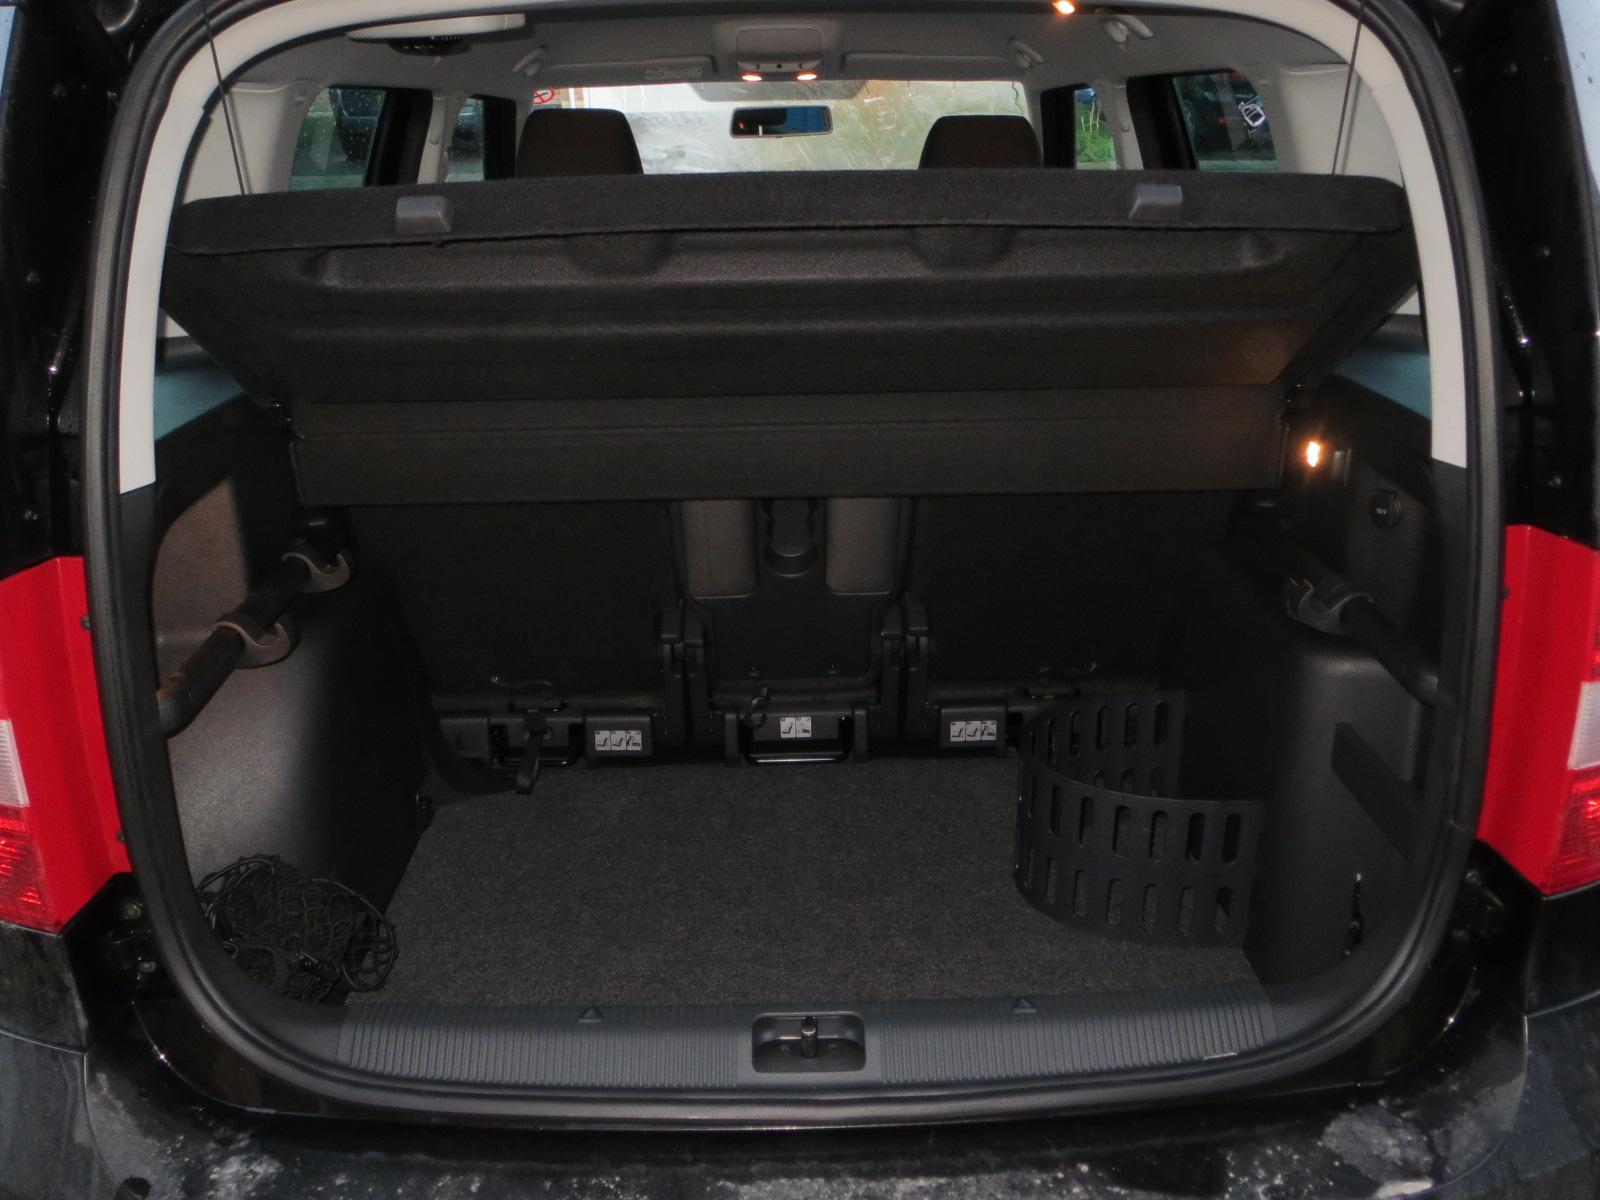 skoda yeti black edition 4x4 2 0 tdi 140ps road test. Black Bedroom Furniture Sets. Home Design Ideas